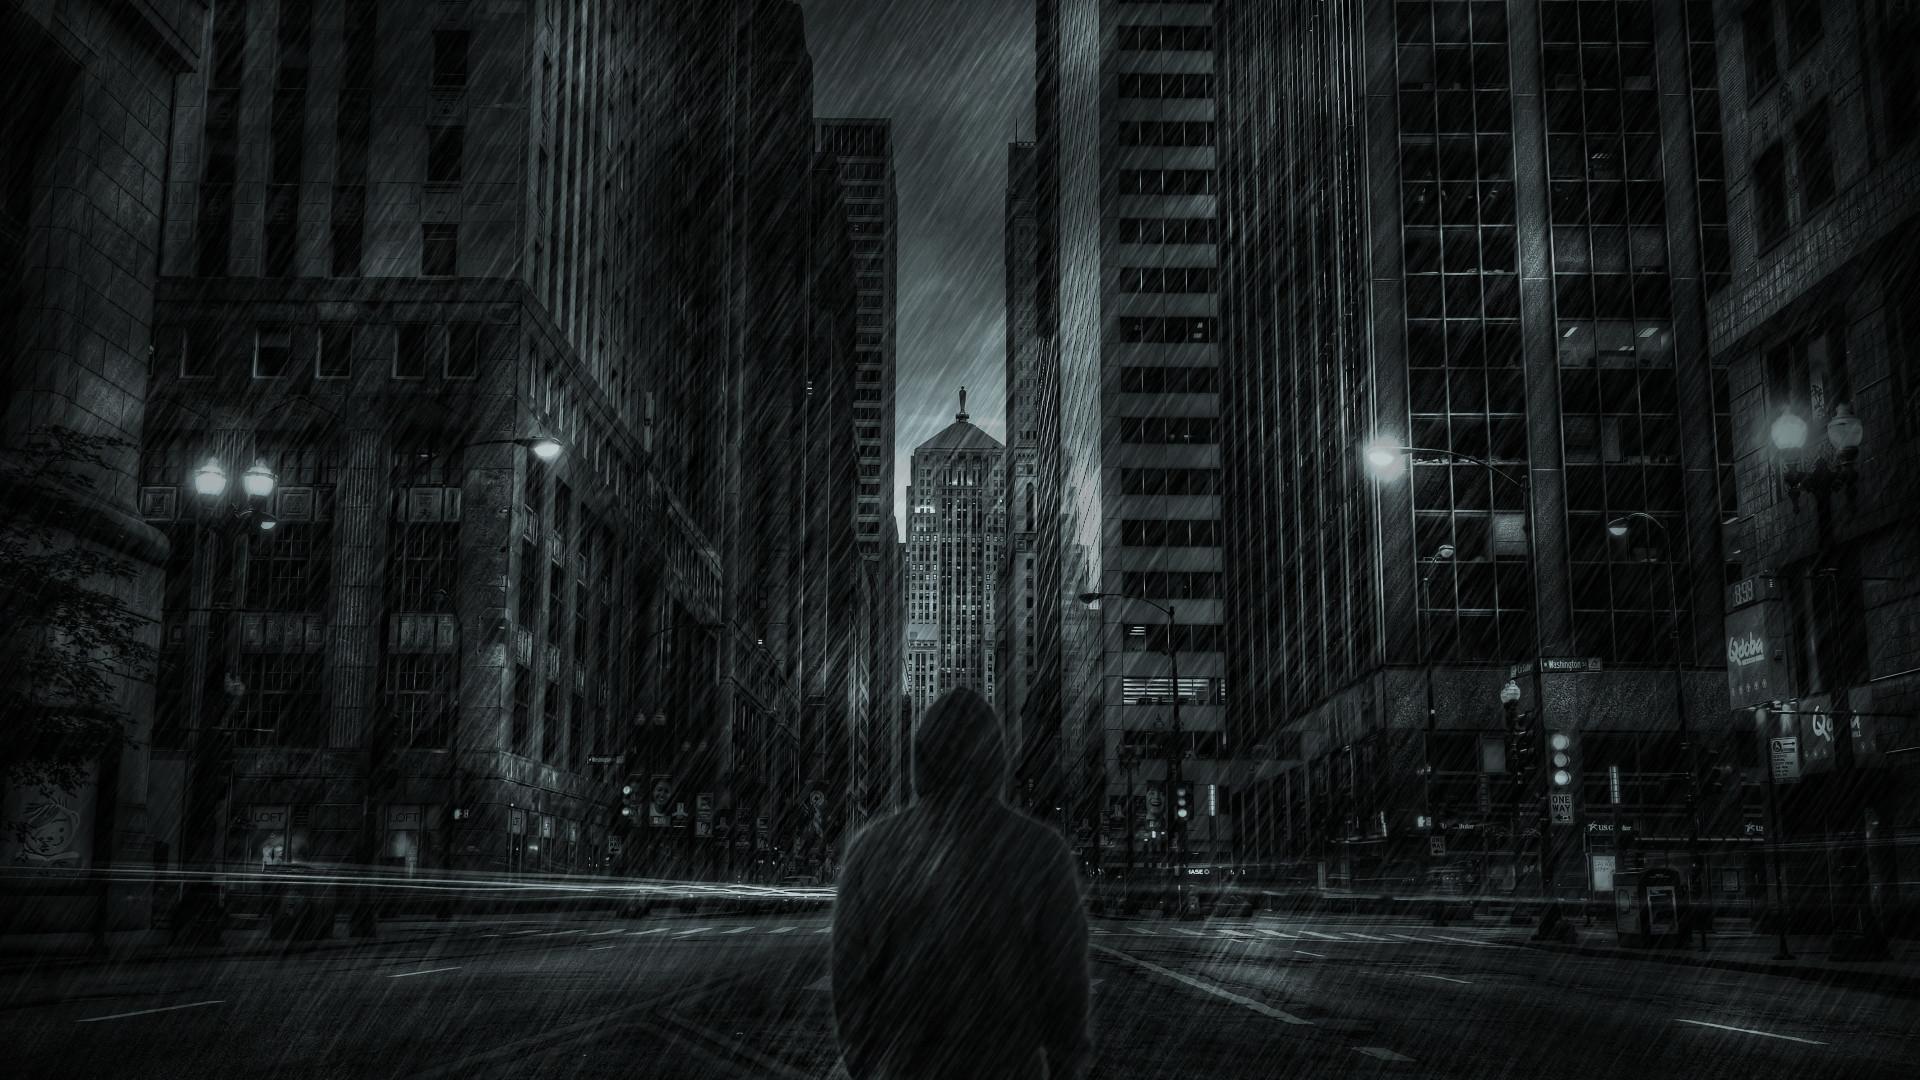 Buildings Skyscrapers Hoodie Rain Storm mood dark wallpaper | |  220368 | WallpaperUP